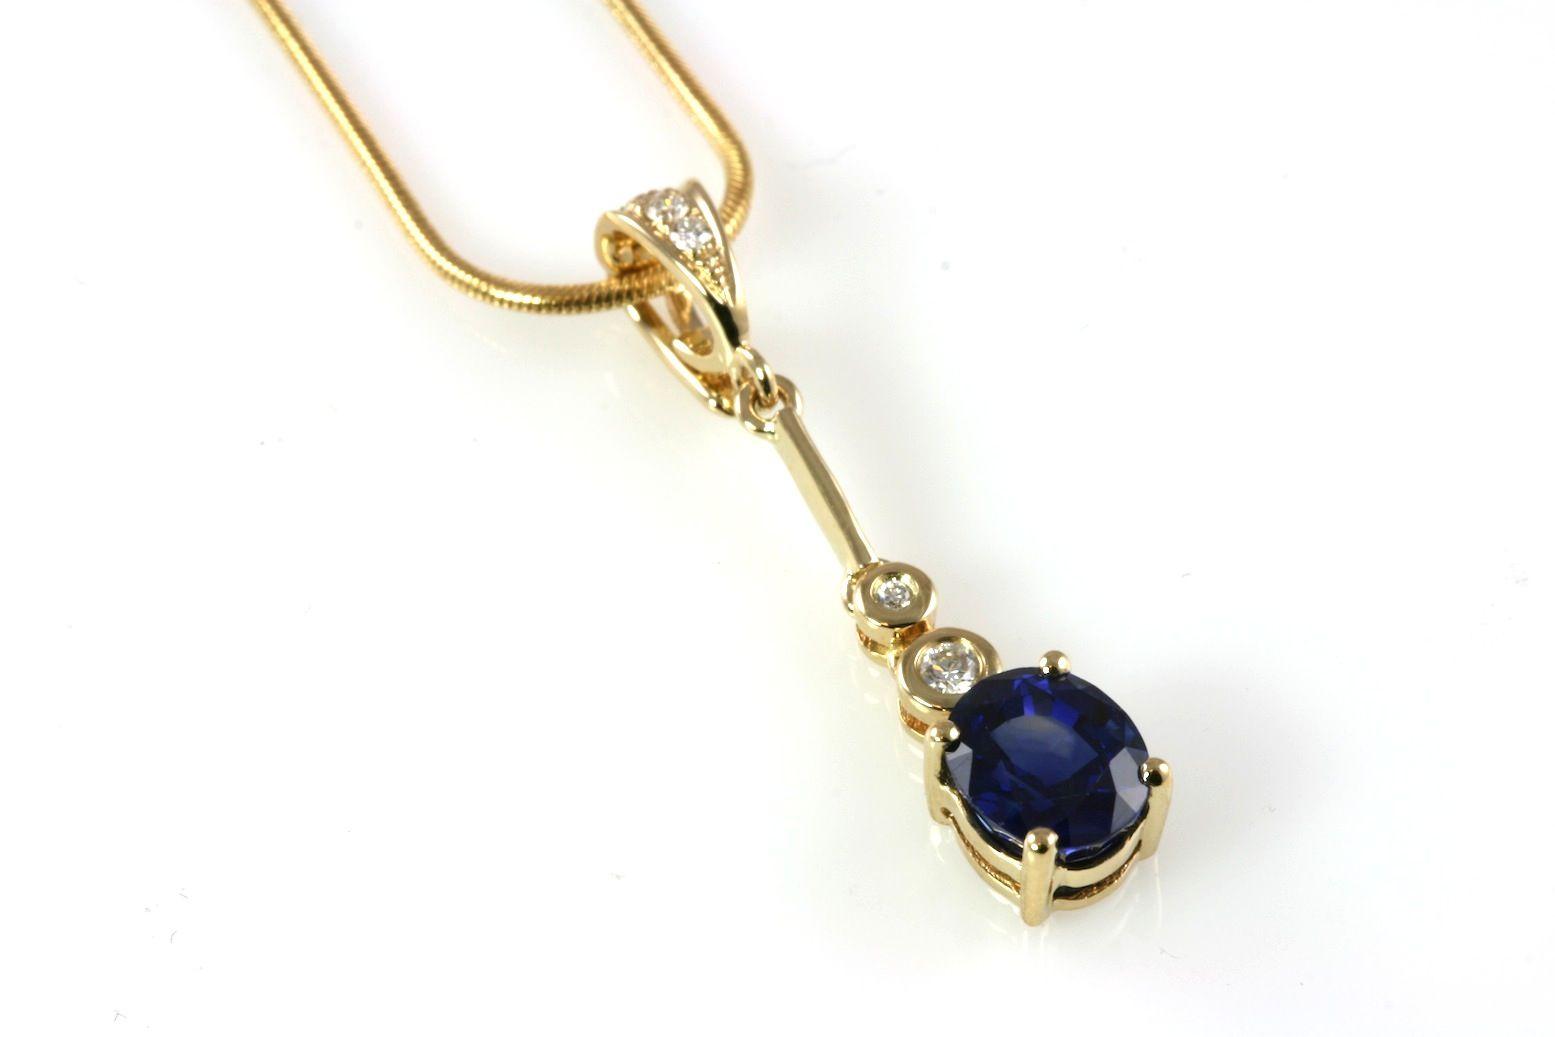 K yellow gold pendant with bezel set diamond accents diamond